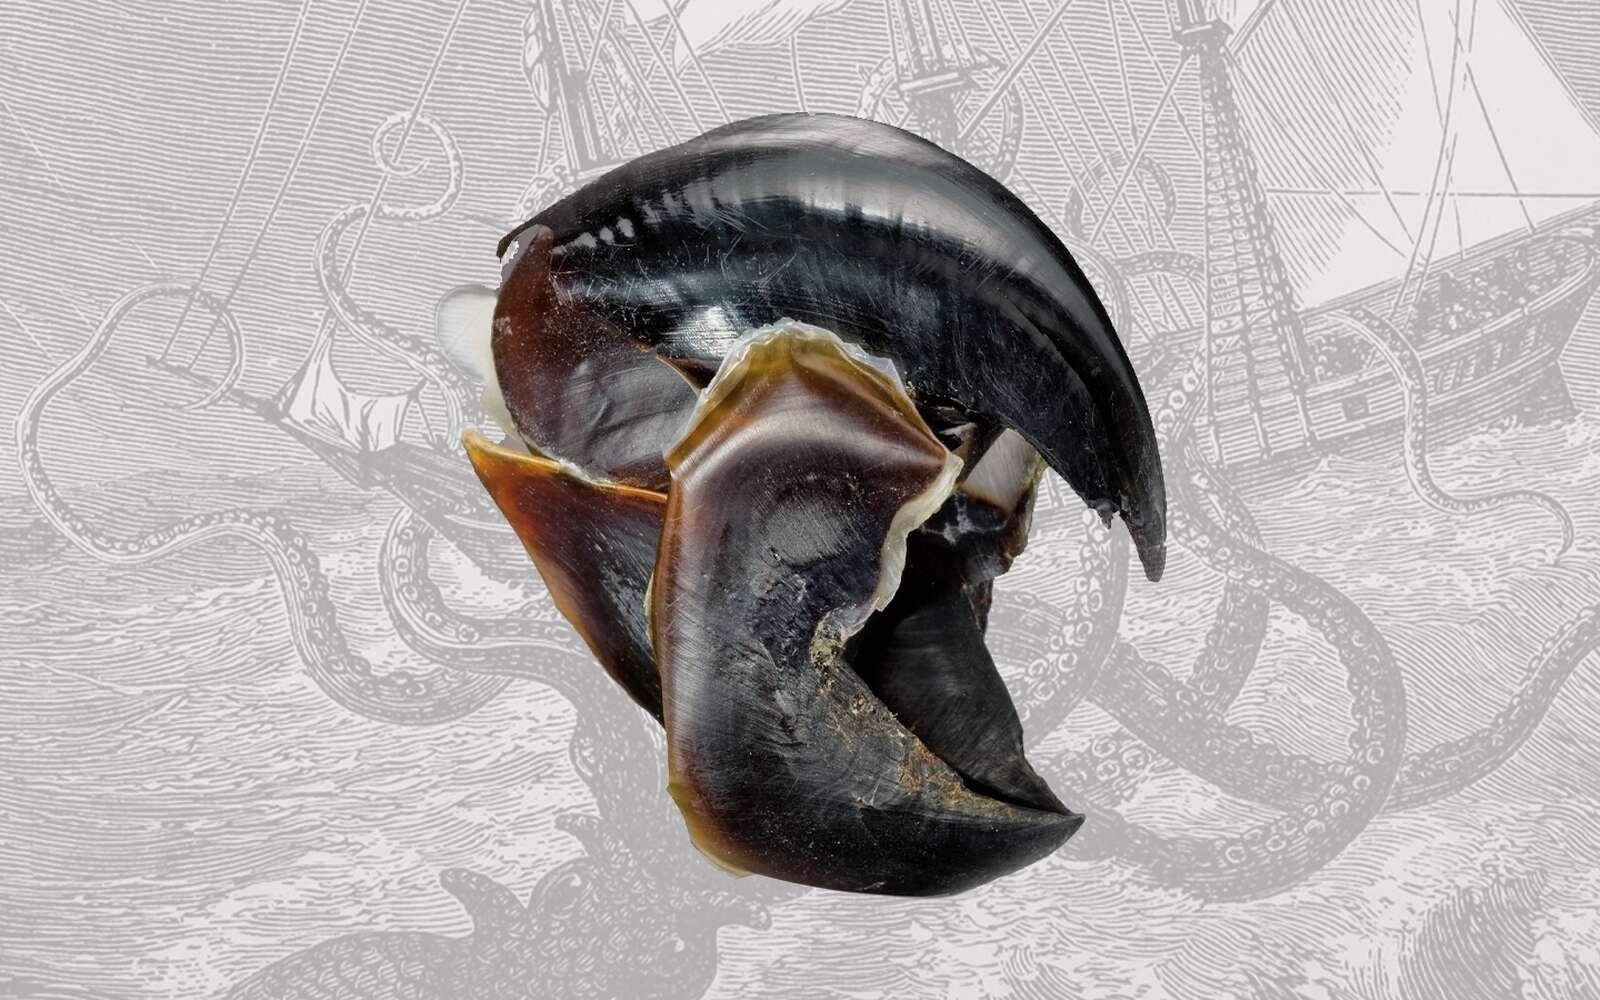 Le bec acéré du calamar de Humboldt est particulièrement solide. © HA.com, Wikimedia Commons, Futura